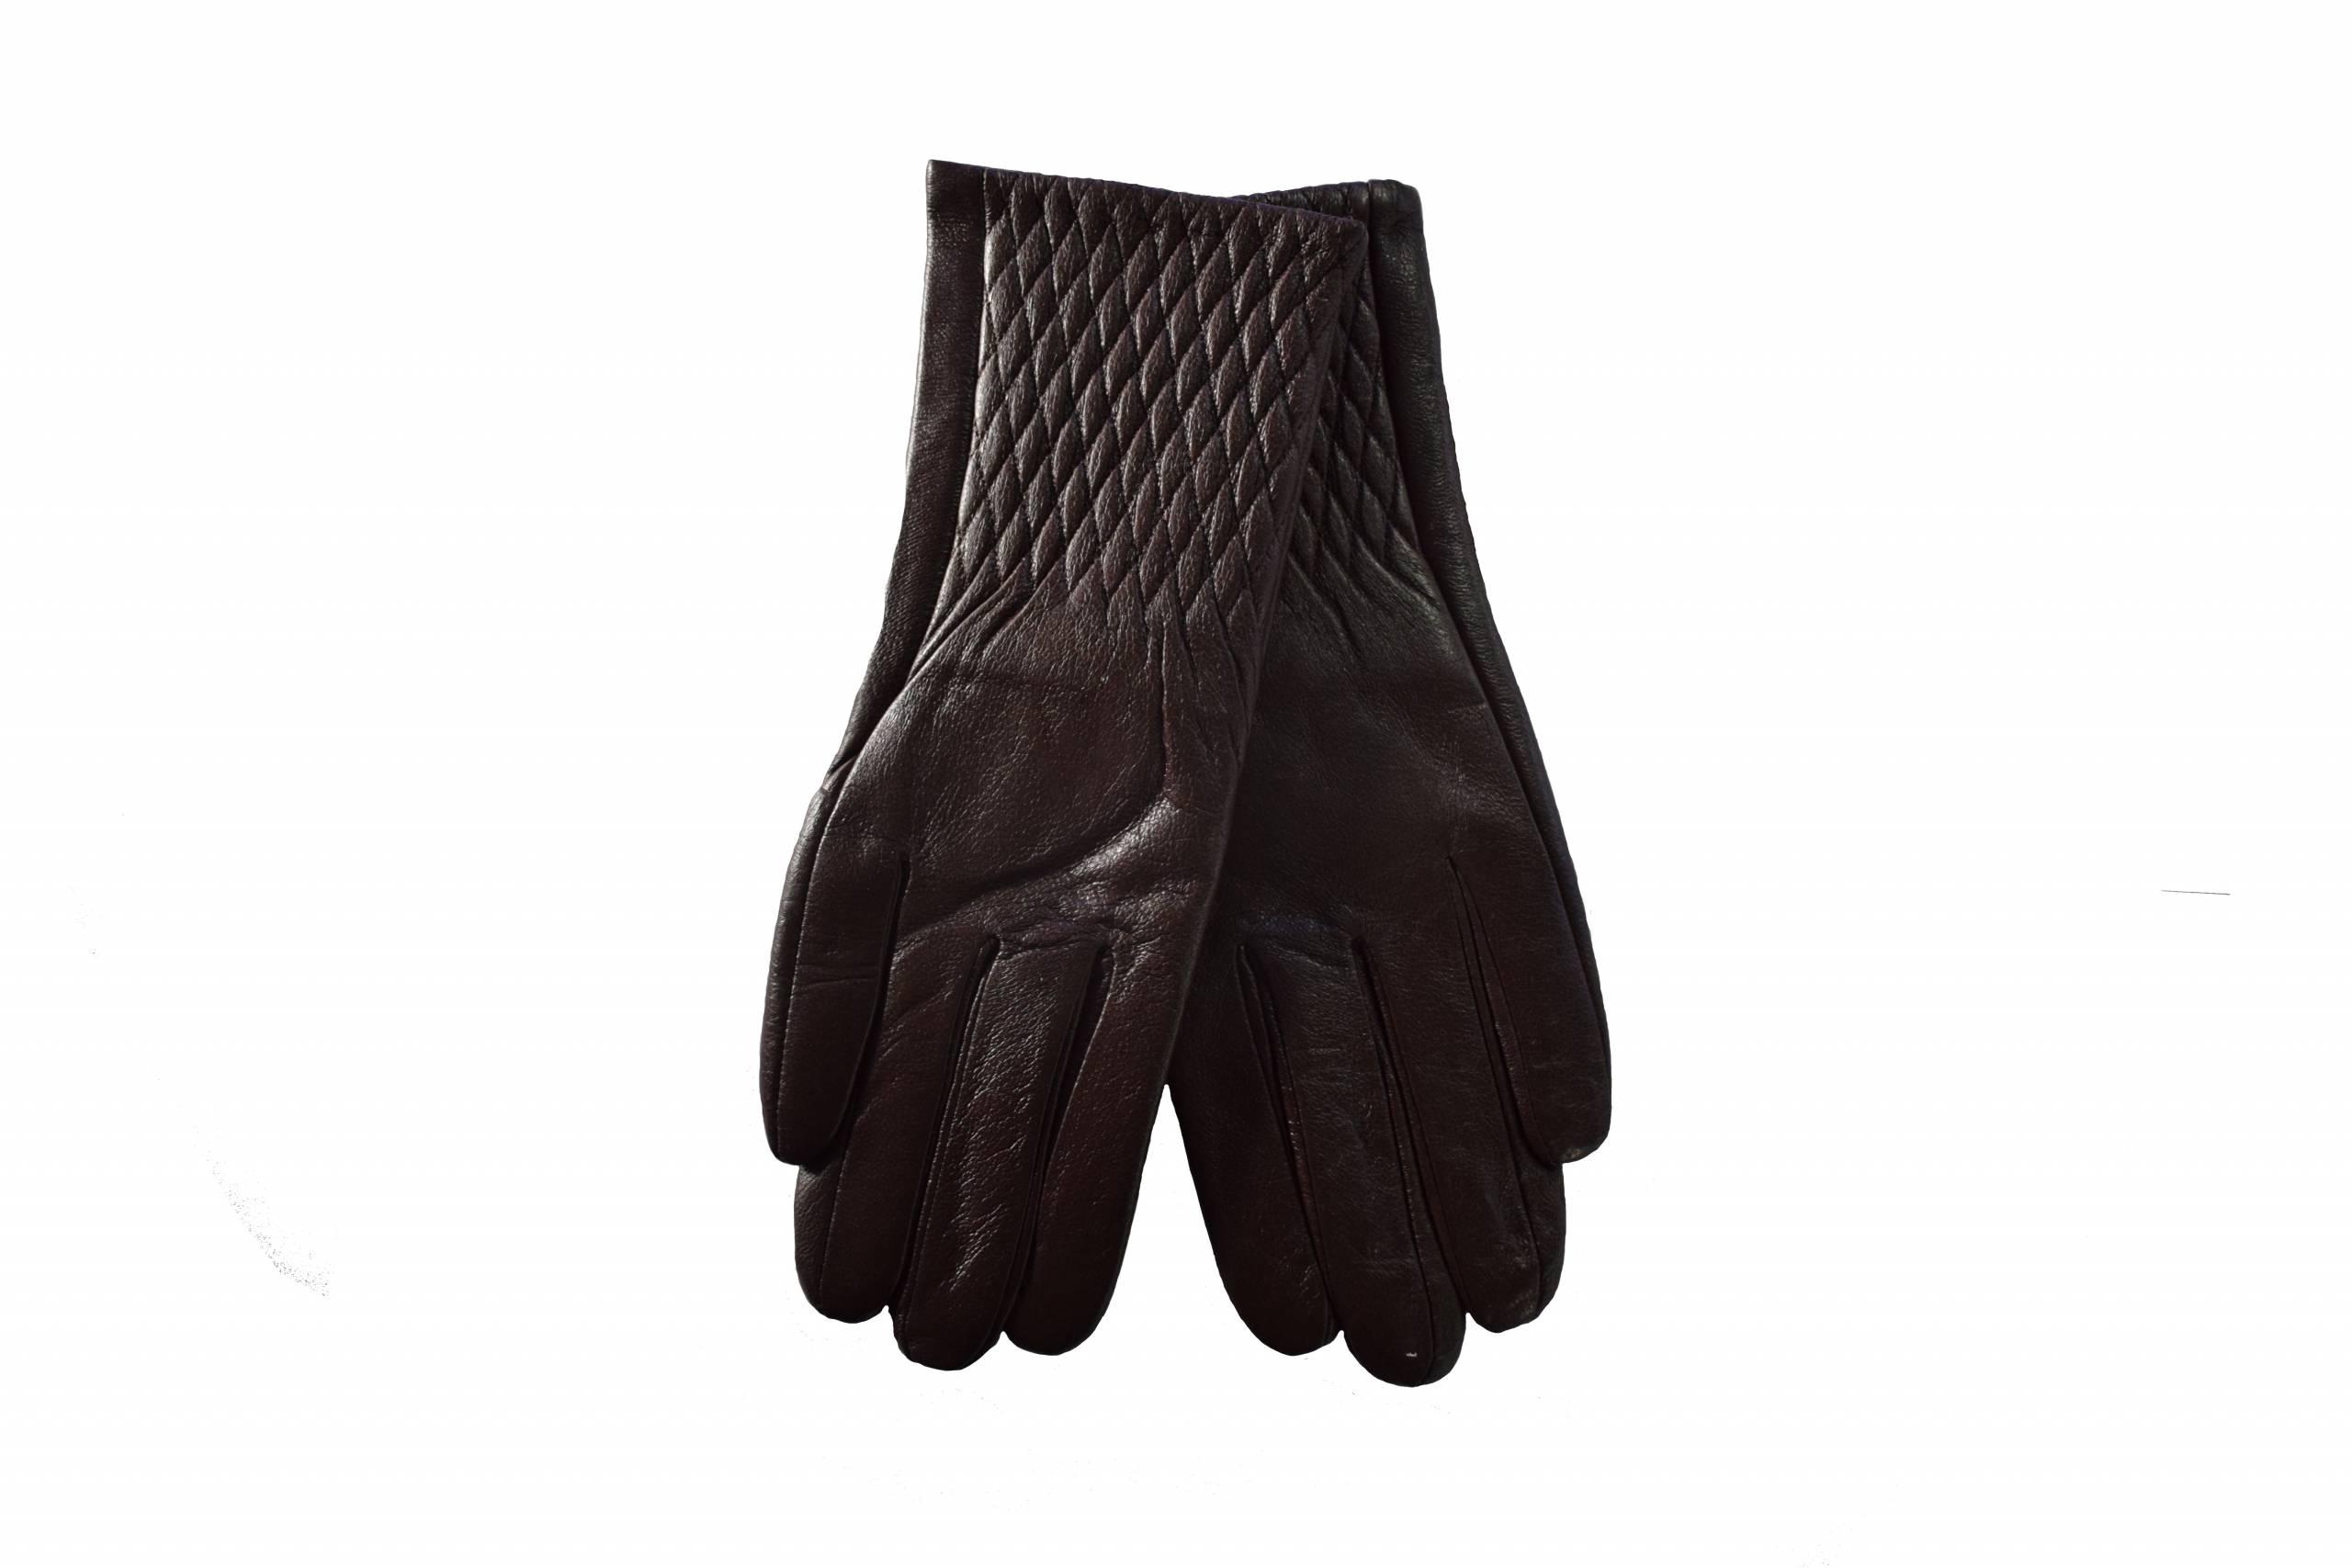 Quivano ladies leather glove brown xs product image